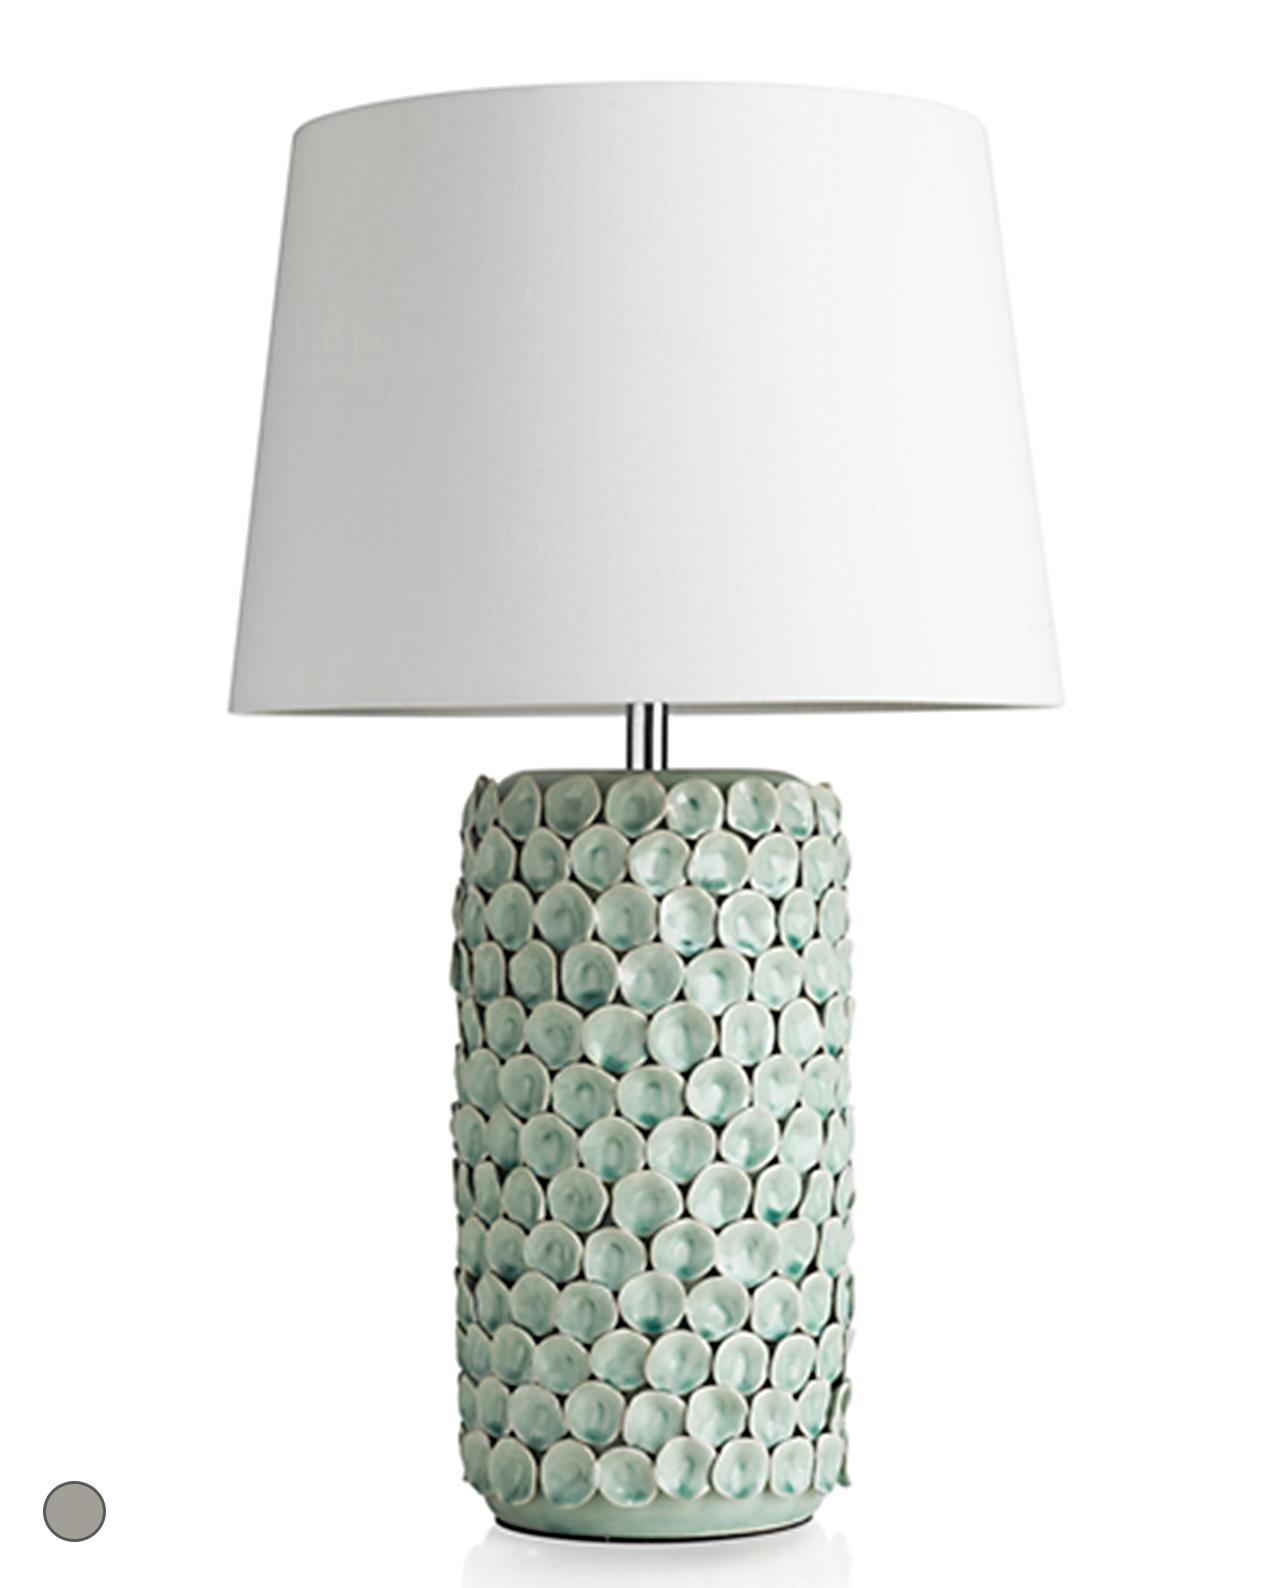 https://mobiliastore.it/wp-content/uploads/2017/11/lampada-in-ceramica-decorata-linea-petali-brandani.jpg